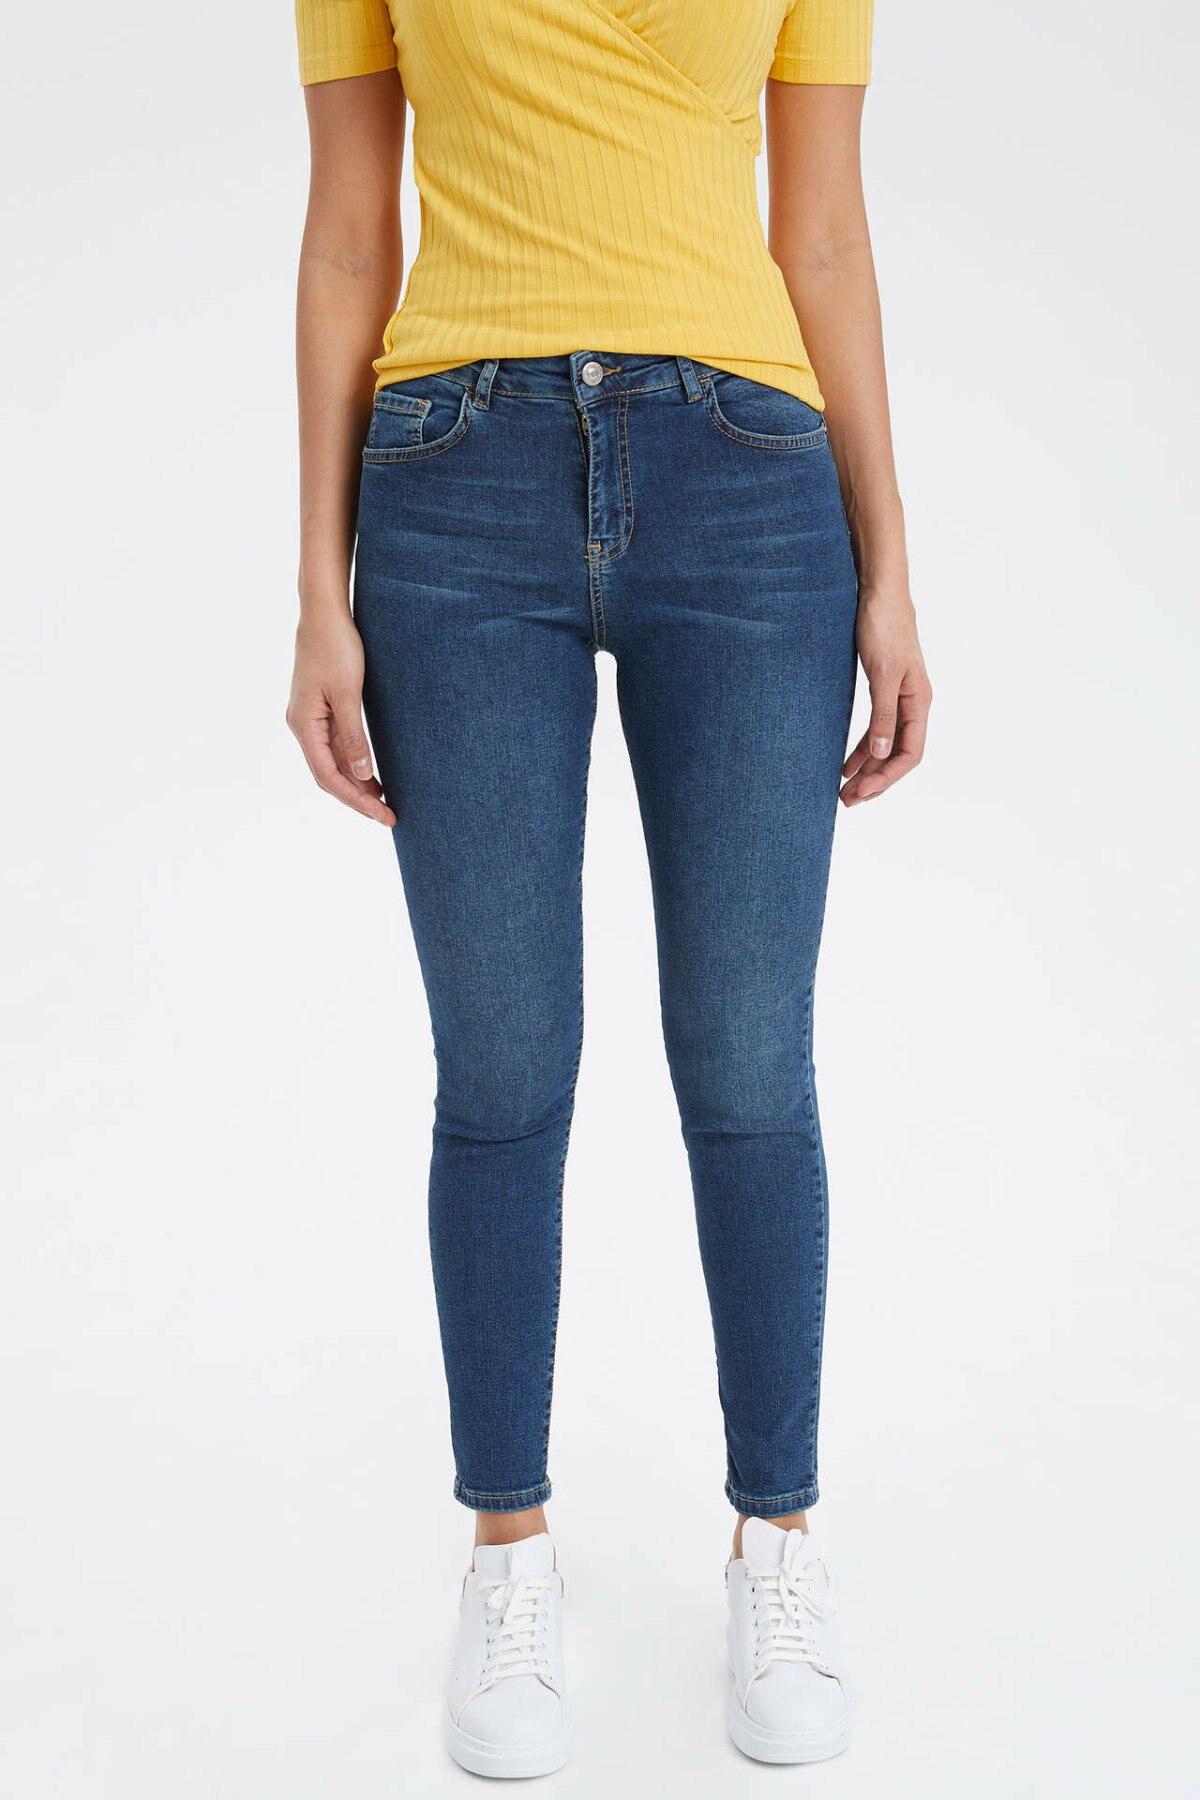 DeFacto Woman Spring Skinny Blue Denim Jeans Women Casual Mid-waist Denim Pants Women Casual Denim Trousers-K5716AZ19SP